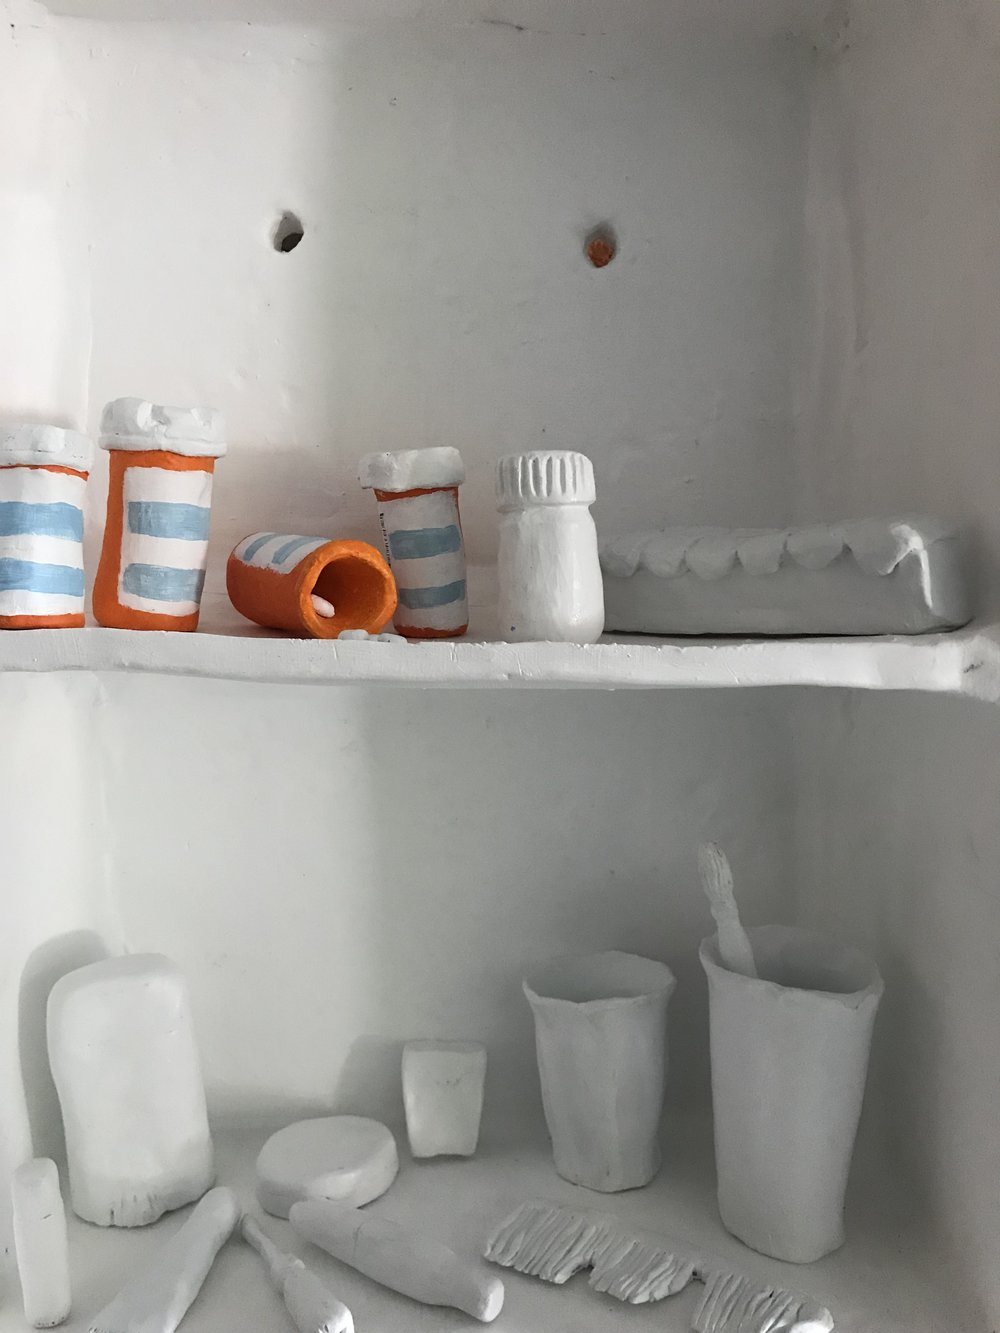 Katy Dai,  Insomnolence,  ceramic, acrylic paint and gloss, dimensions variable